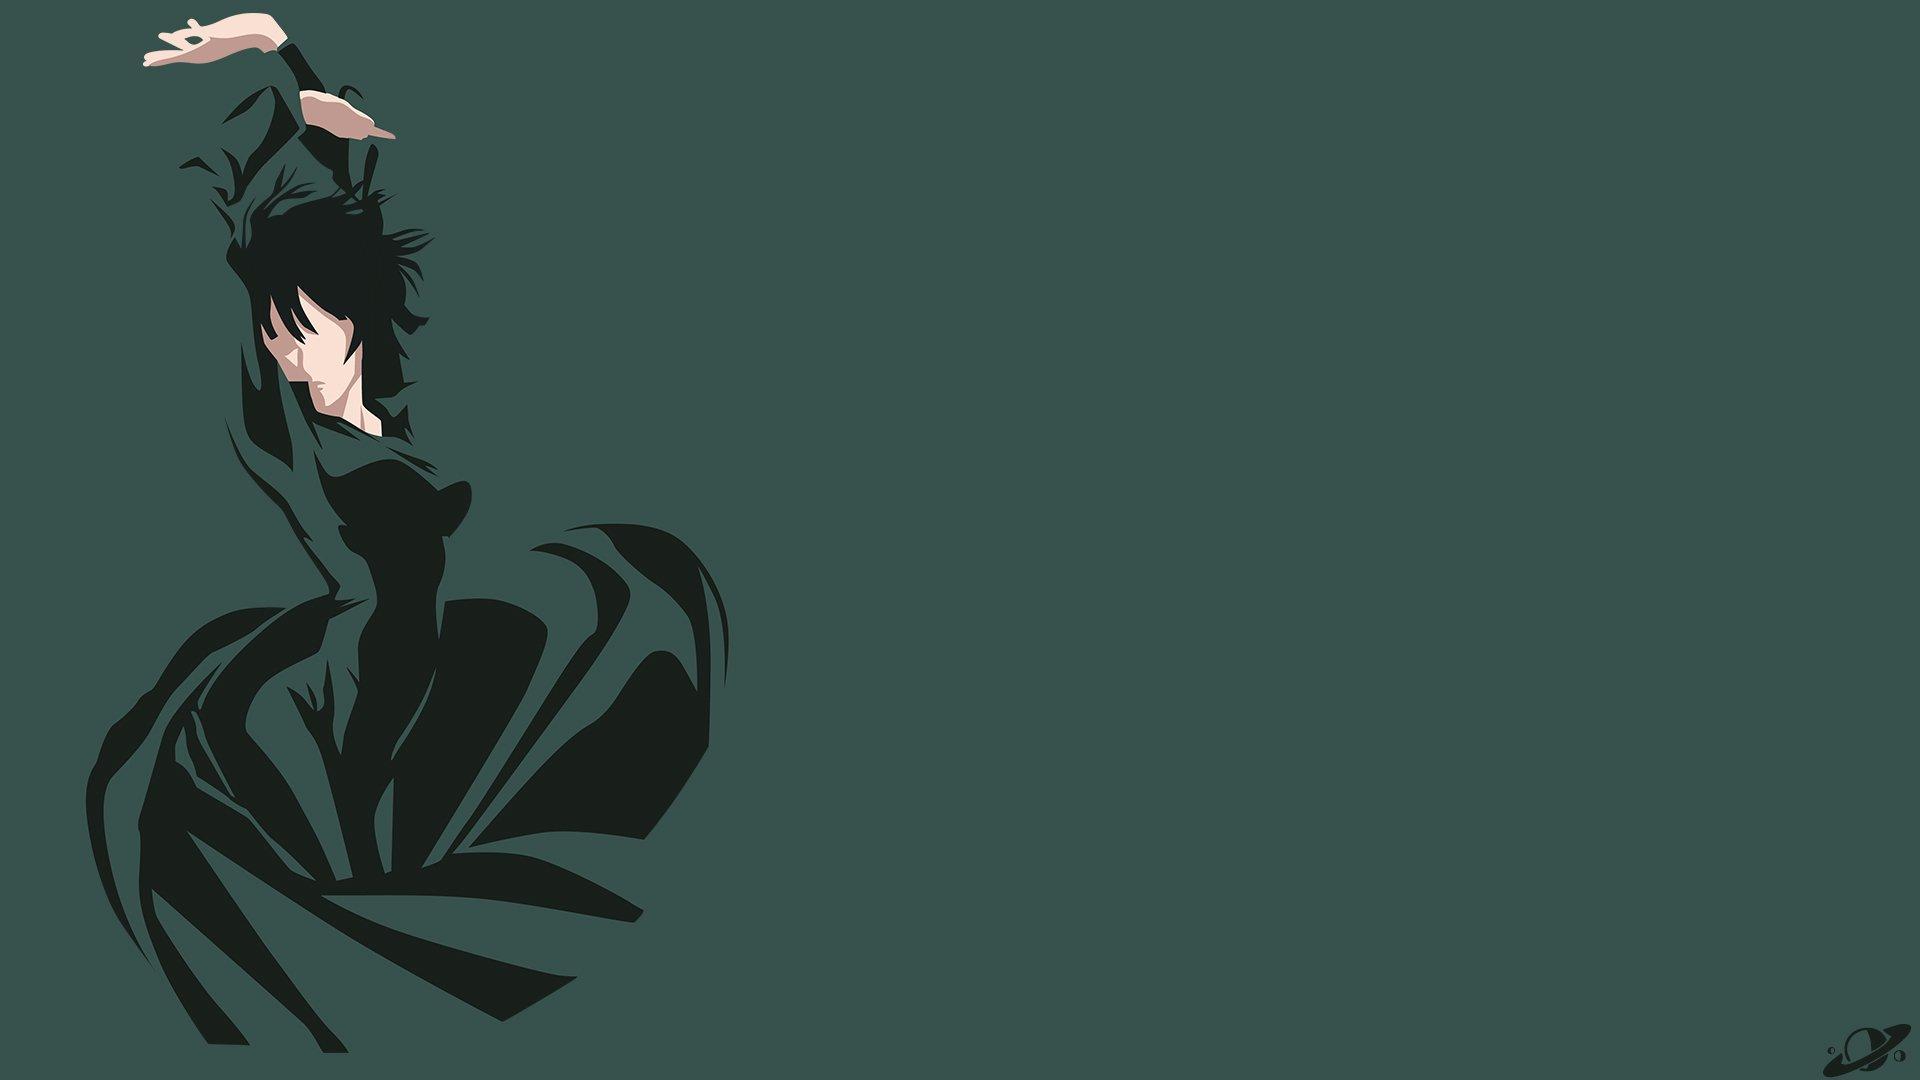 Fubuki Hd Wallpaper Background Image 1920x1080 Id 931390